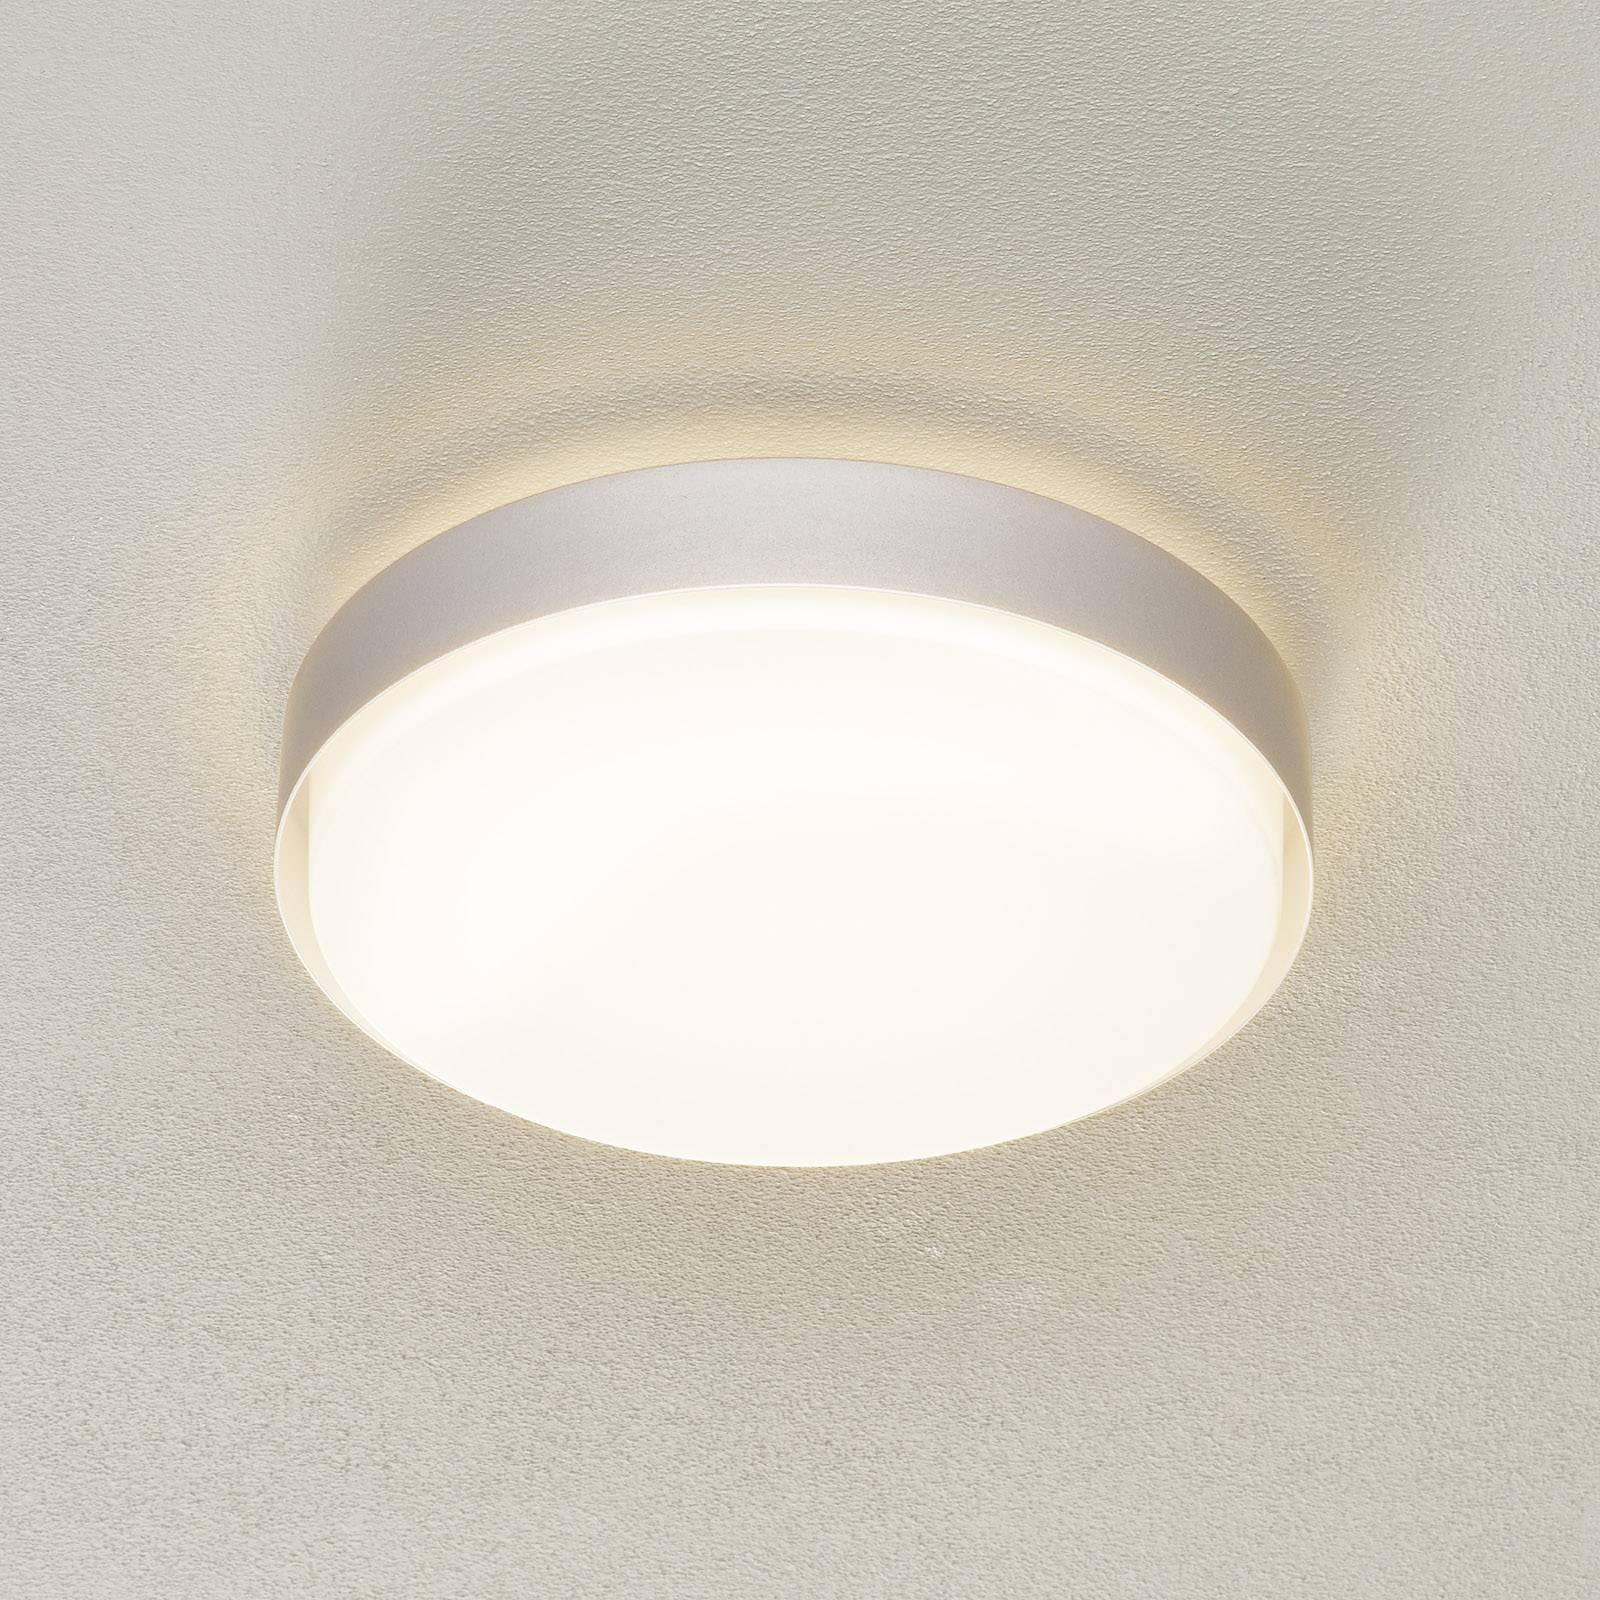 BEGA 34278 LED-kattovalaisin, alumiini, Ø 36 cm